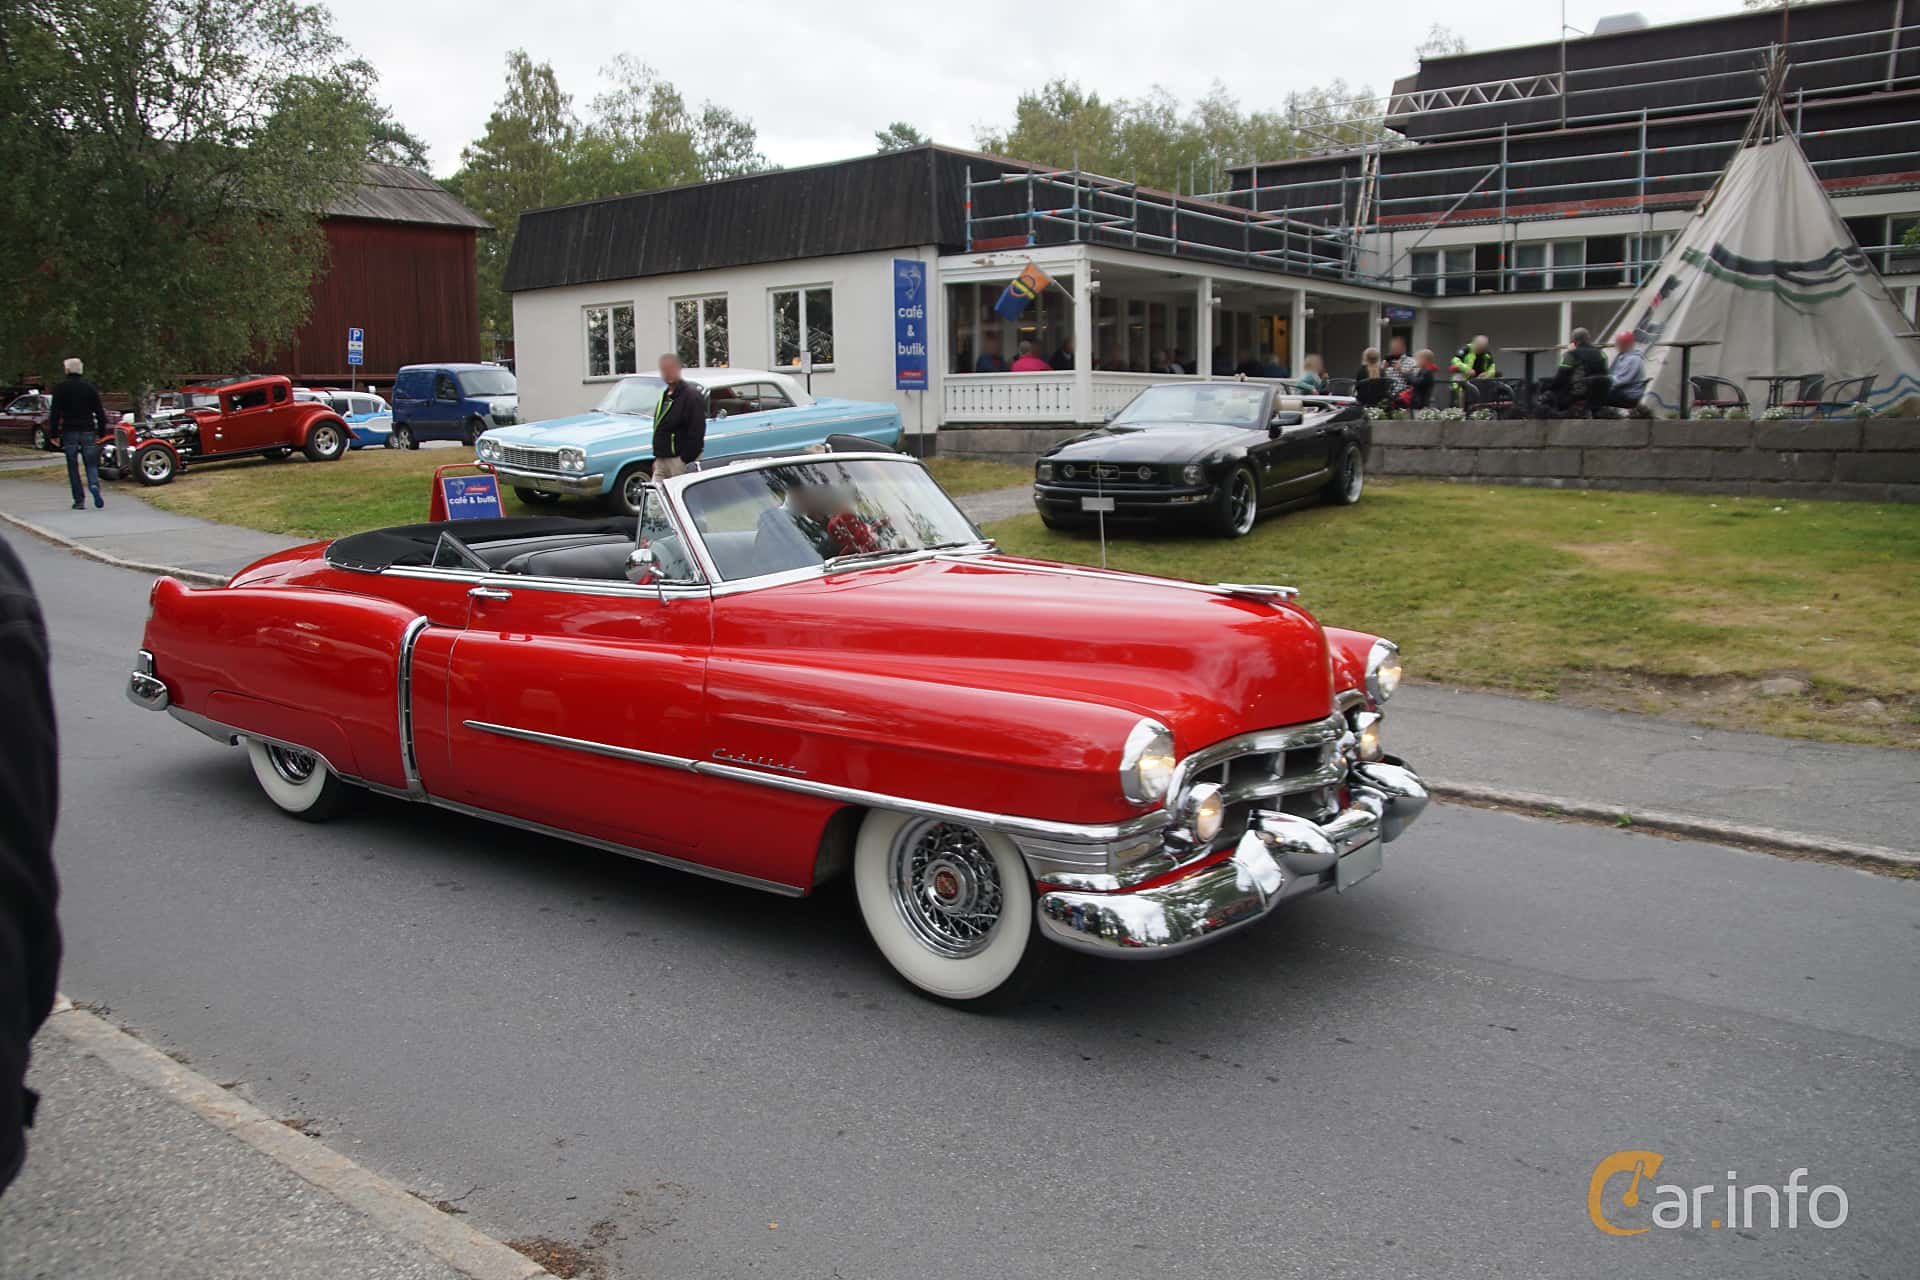 Cadillac Sixty-Two Convertible 5.4 V8 Hydra-Matic, 193hp, 1952 at Onsdagsträffar på Gammlia Umeå 2019 vecka 32